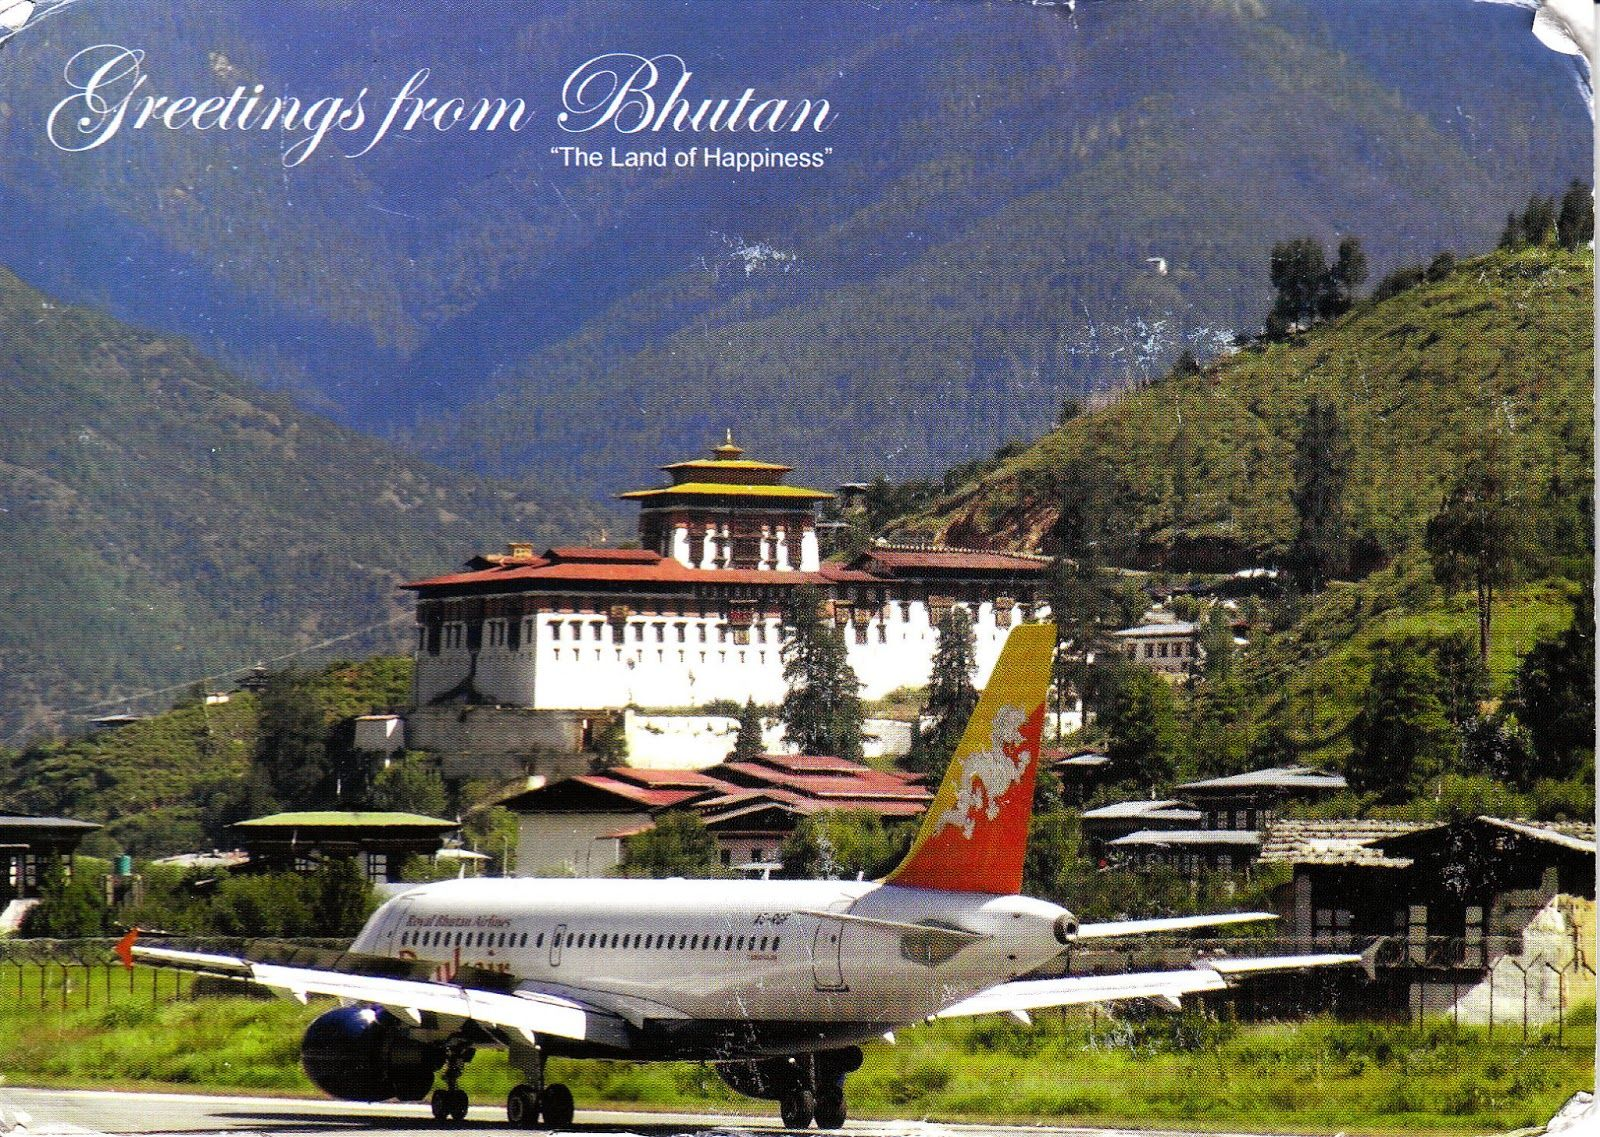 Drukair Royal Bhutan Airlines Airbus A319 On The Runway At Paro Airport Airlines Travel Airbus